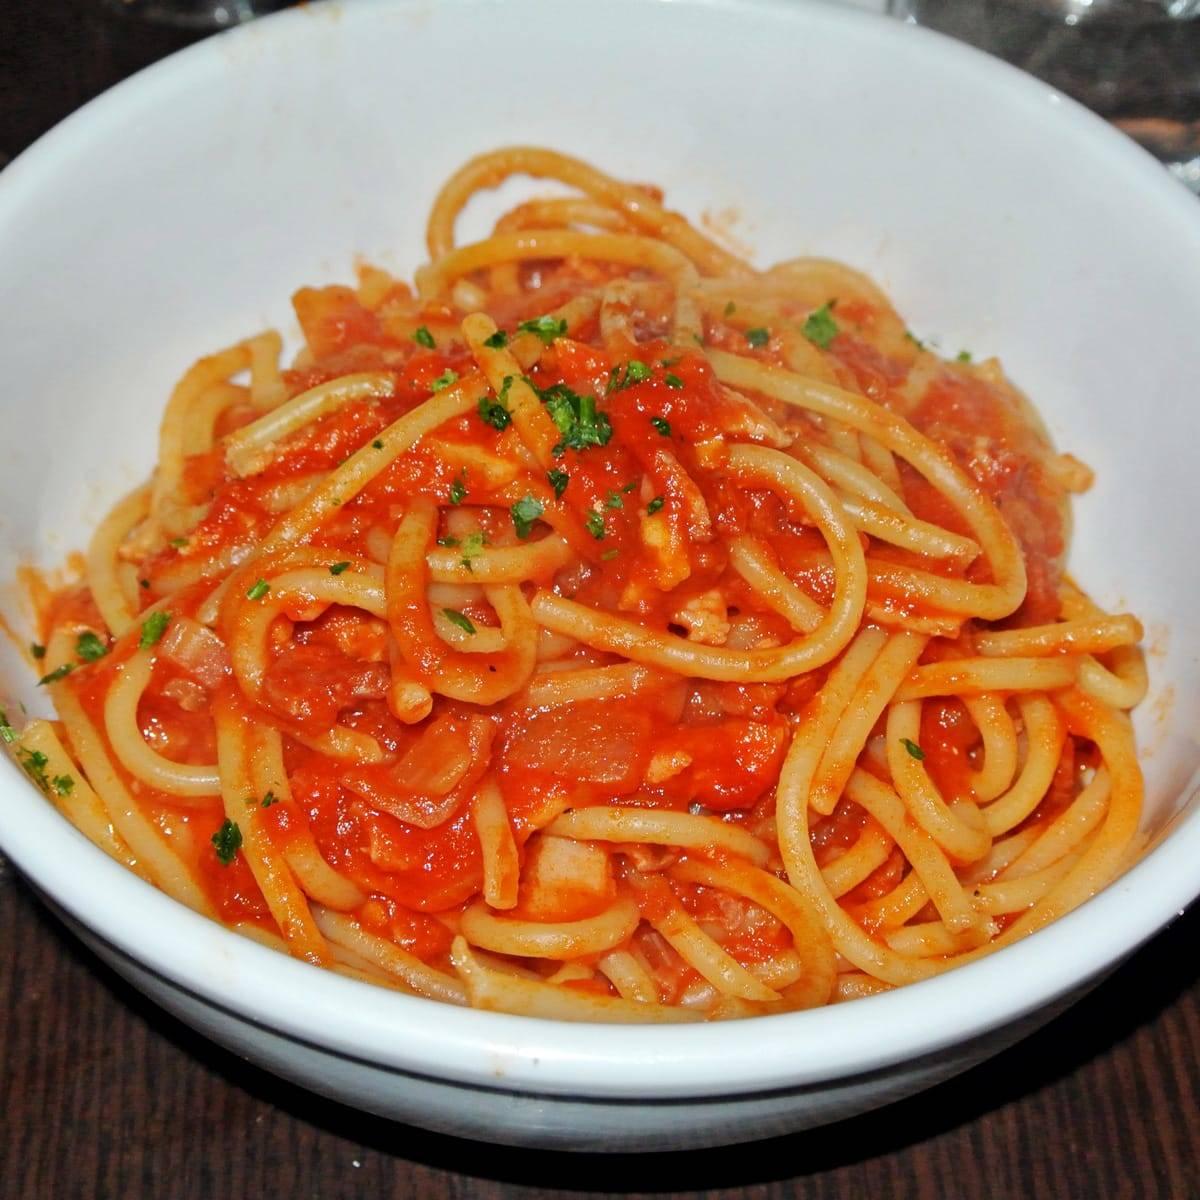 Get a Real, Delicious, Cheap Taste of Italy at Fiat Café in Nolita